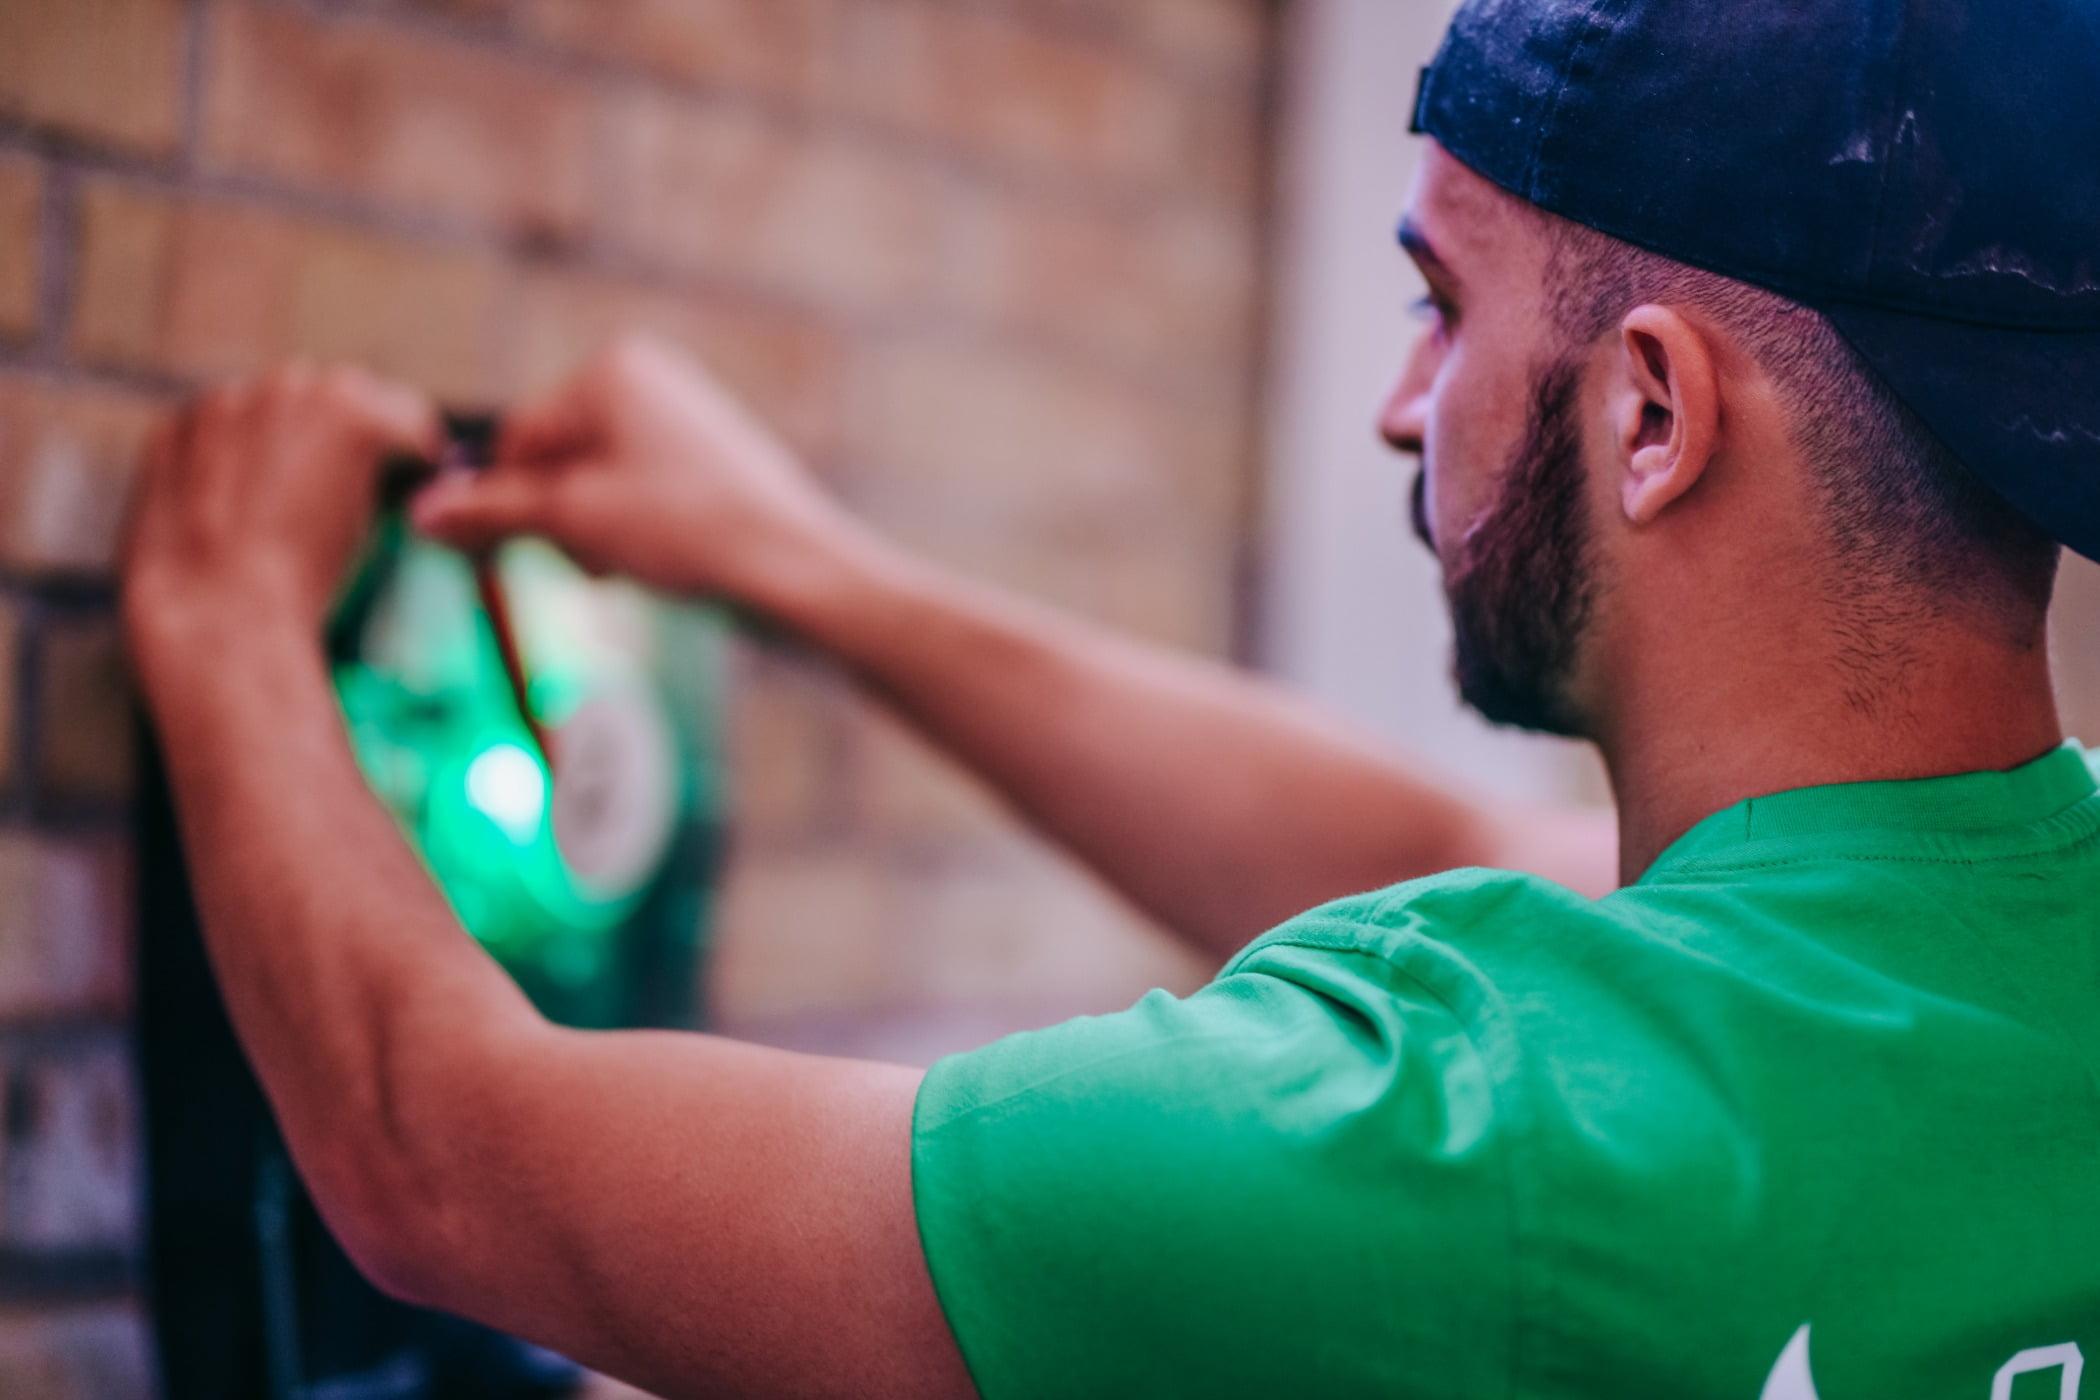 Flash photography, Green, Beard, Gesture, Elbow, T-shirt